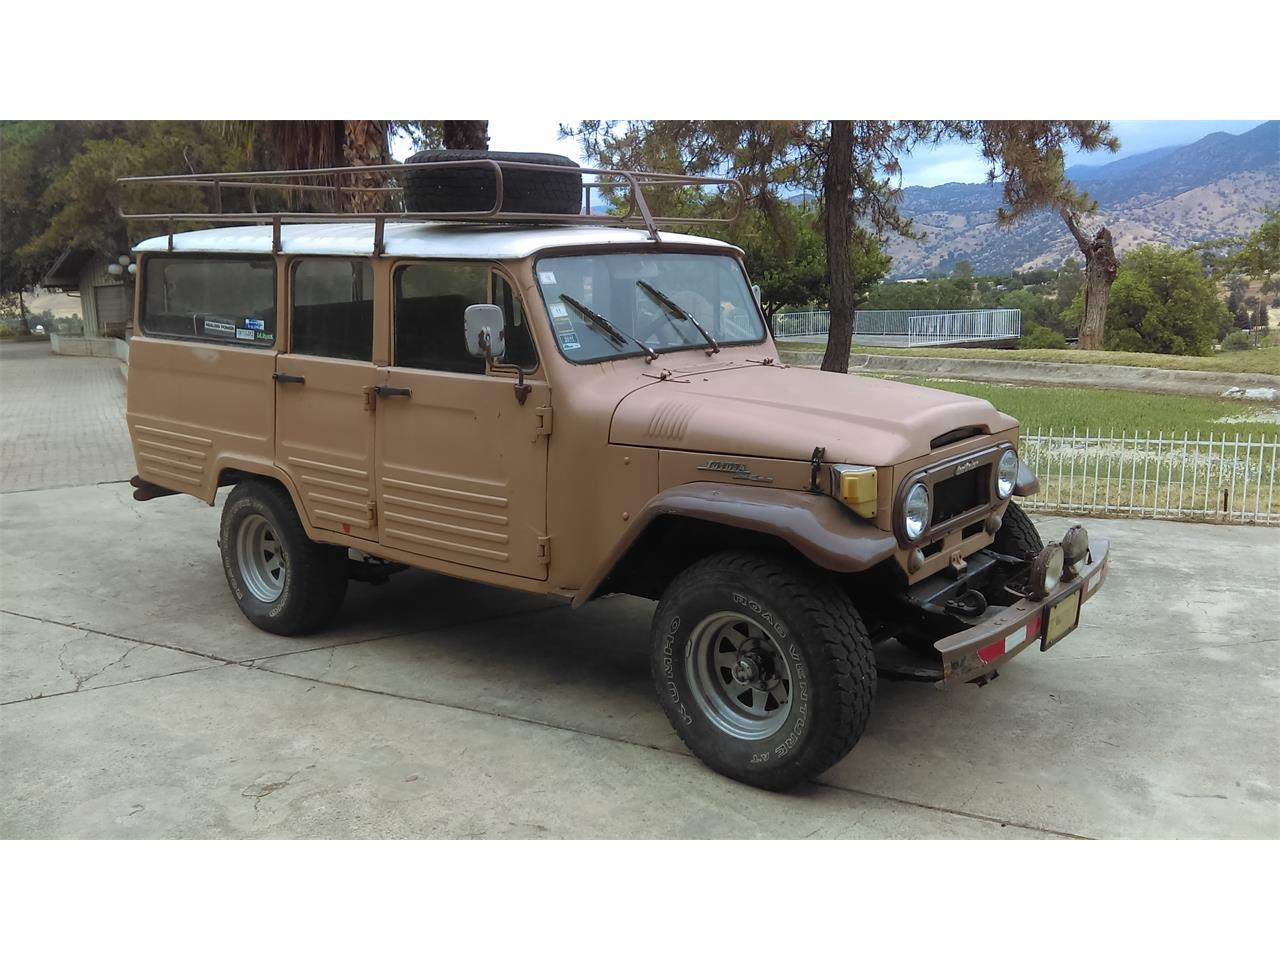 For Sale: 1966 Toyota Land Cruiser FJ45 in Springville, California